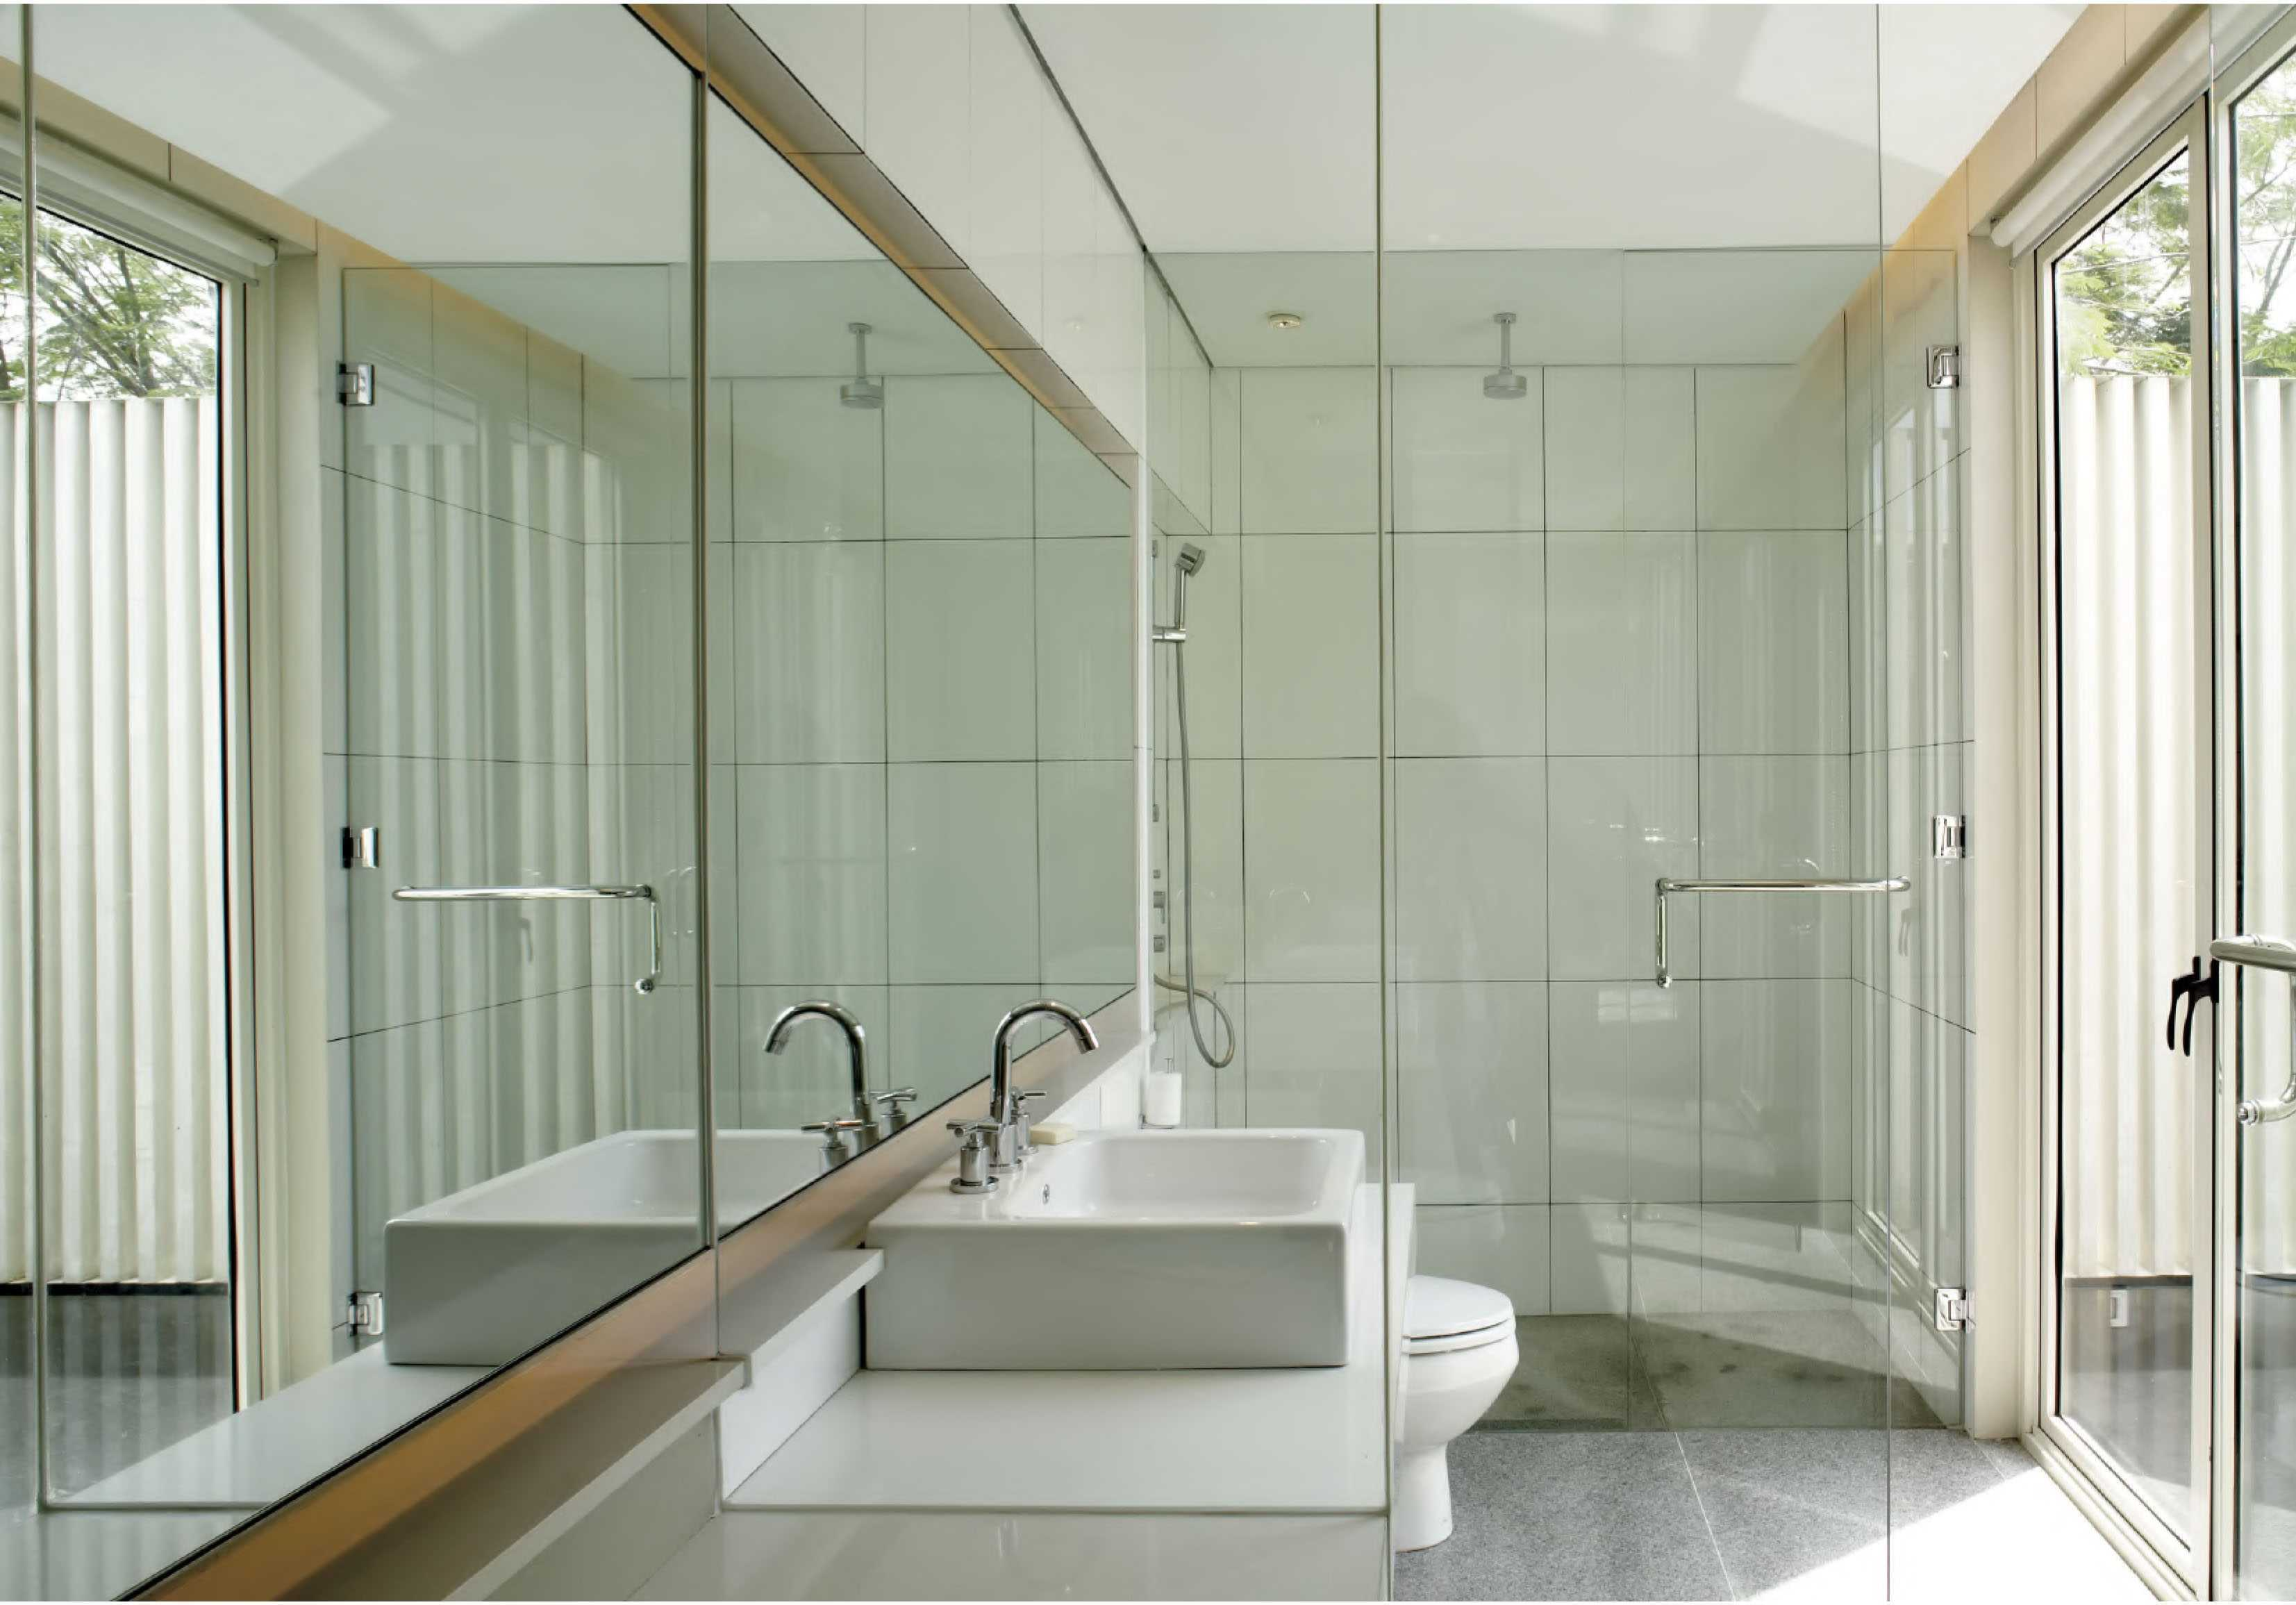 Studio Air Putih Tj_House Rancamaya, Bogor Rancamaya, Bogor Bathroom   25011